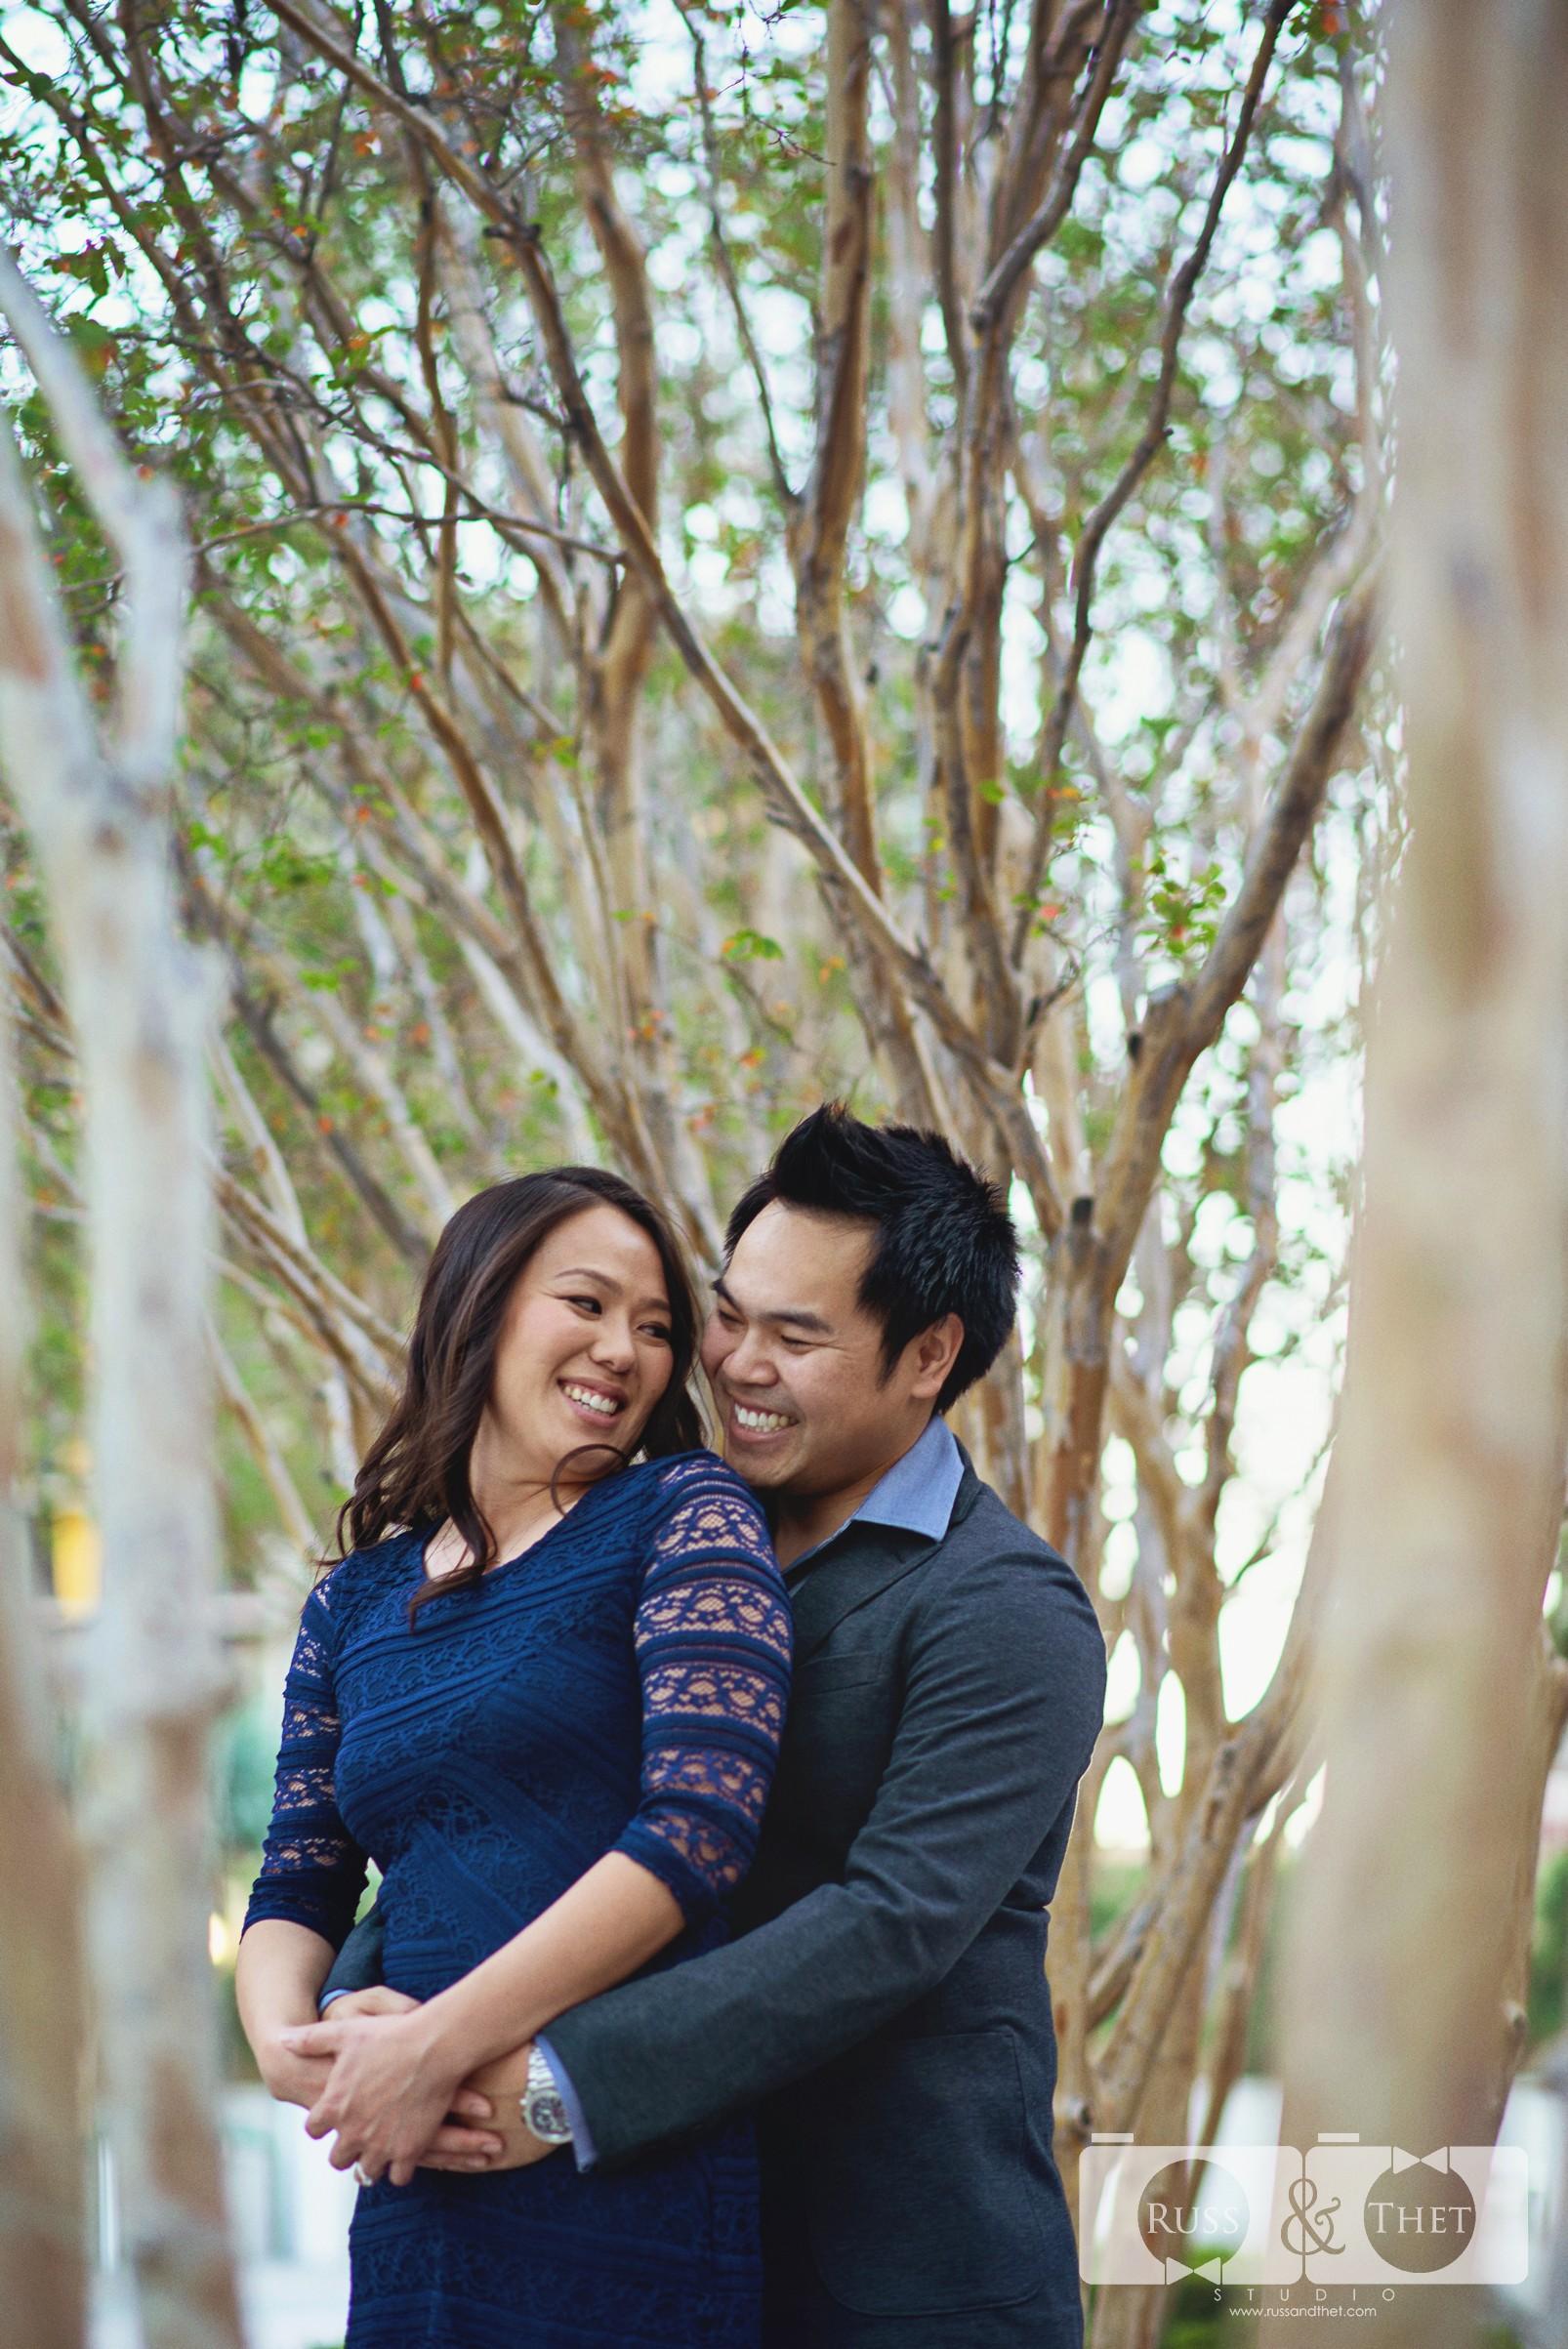 Emero_Lucinda_Downtown_Los_Angeles_Engagement_Photographer (11).jpg